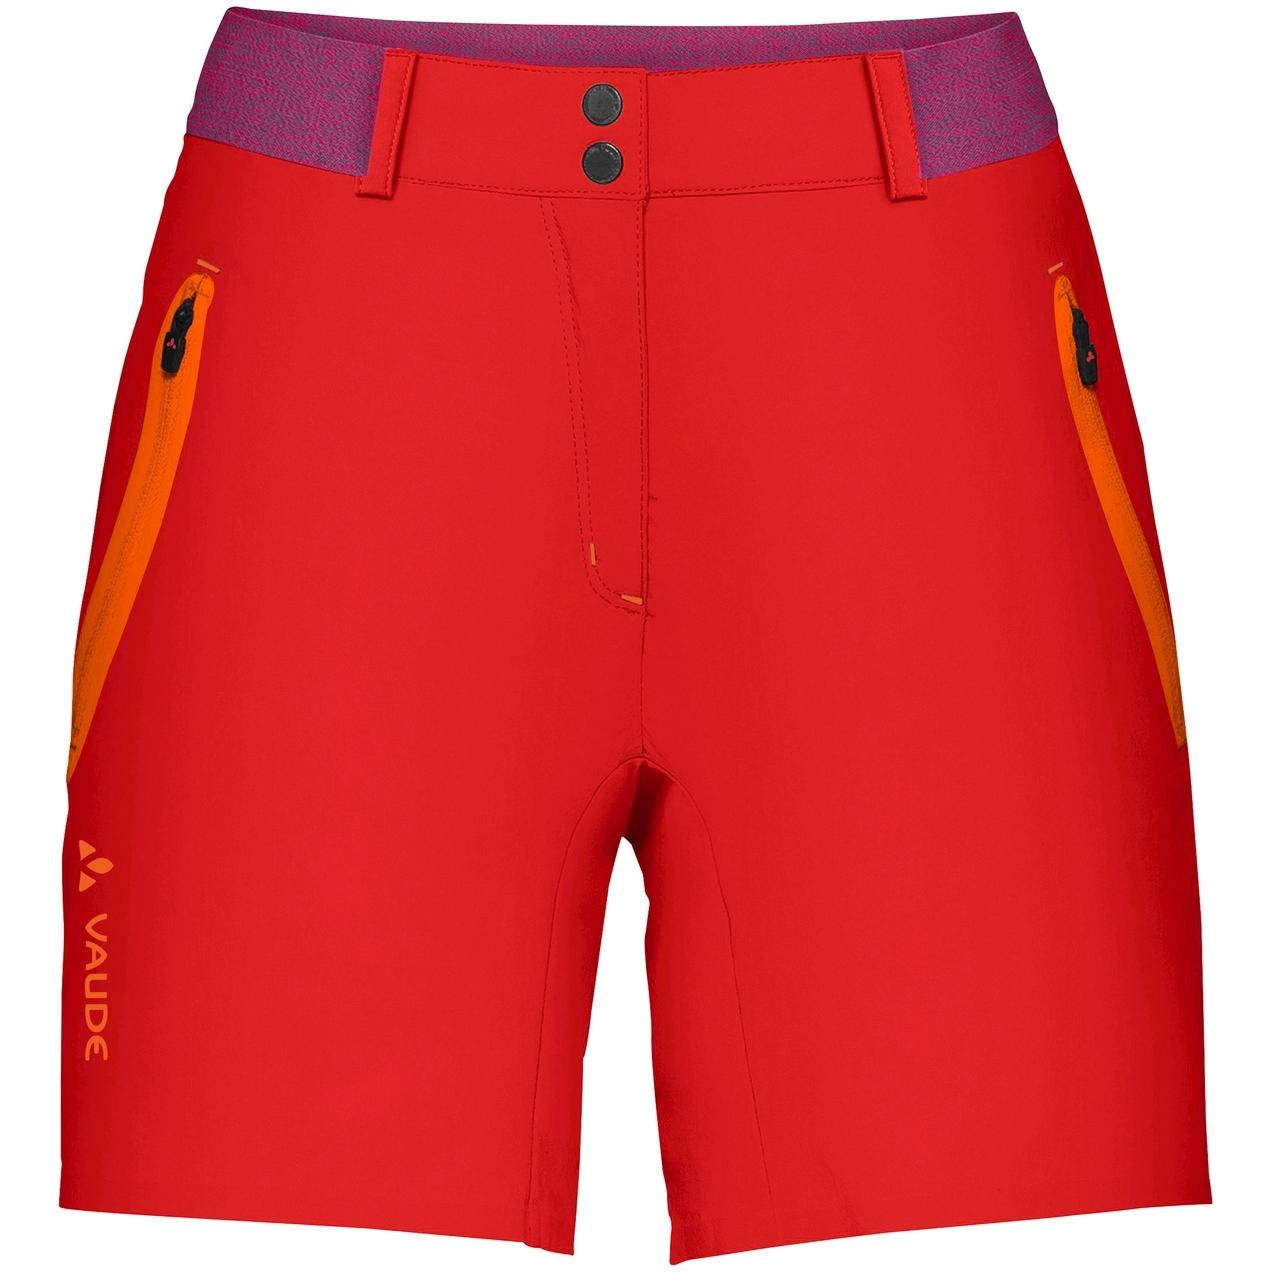 Vaude Scopi LW Damen-Shorts II - mars red